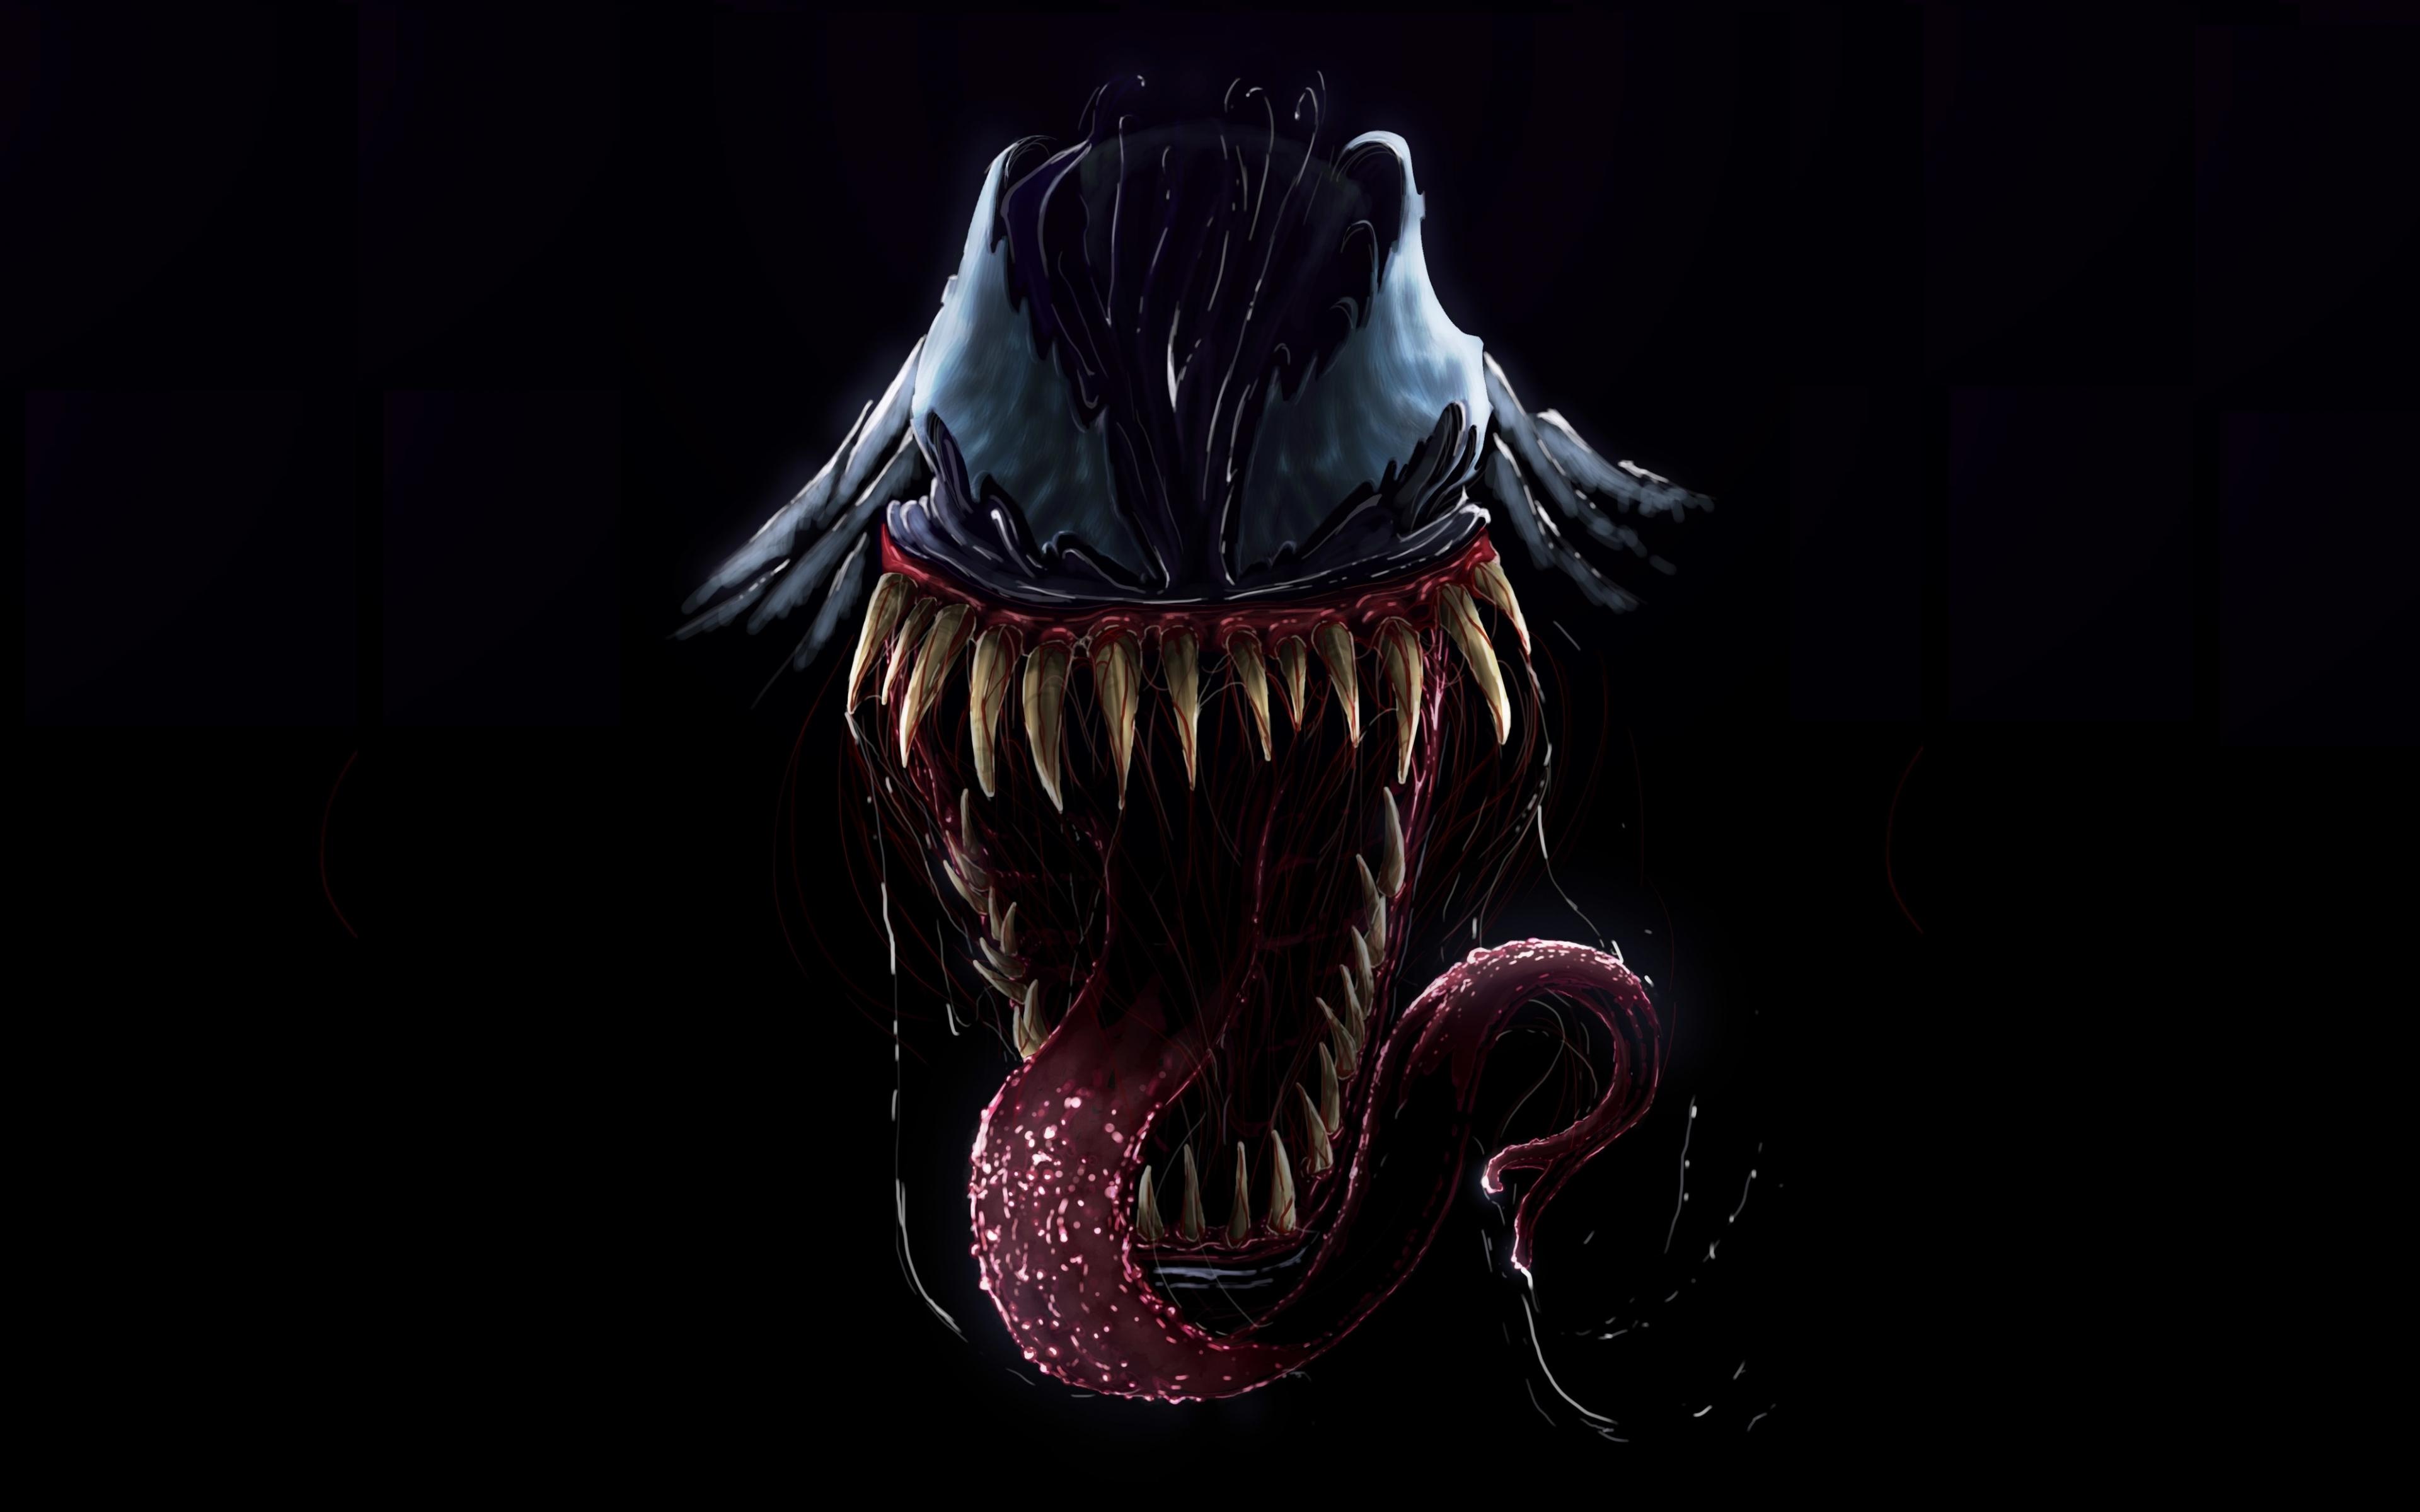 Download 3840x2400 Wallpaper Artwork Villain Venom 4k Ultra Hd